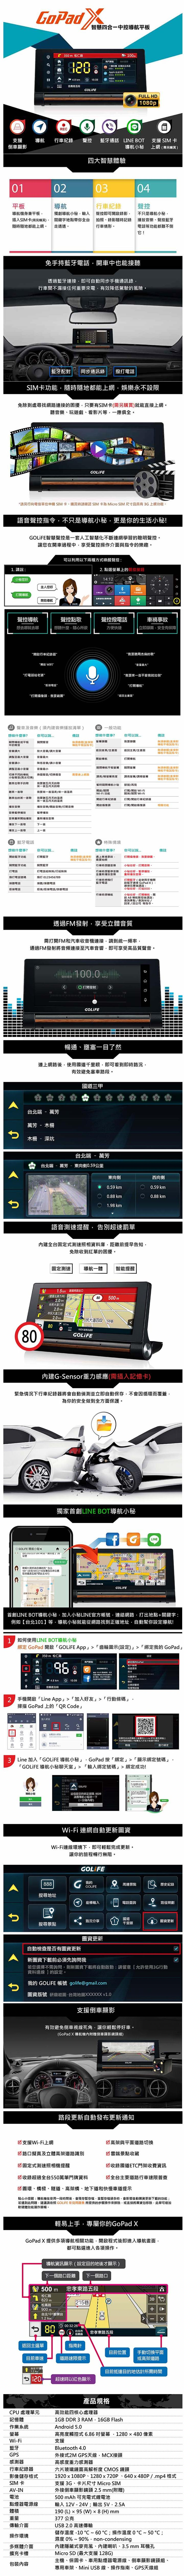 GOLiFE GoPad X 智慧四合一中控行車導航平板  附倒車顯影鏡頭組  - PChome 24h購物